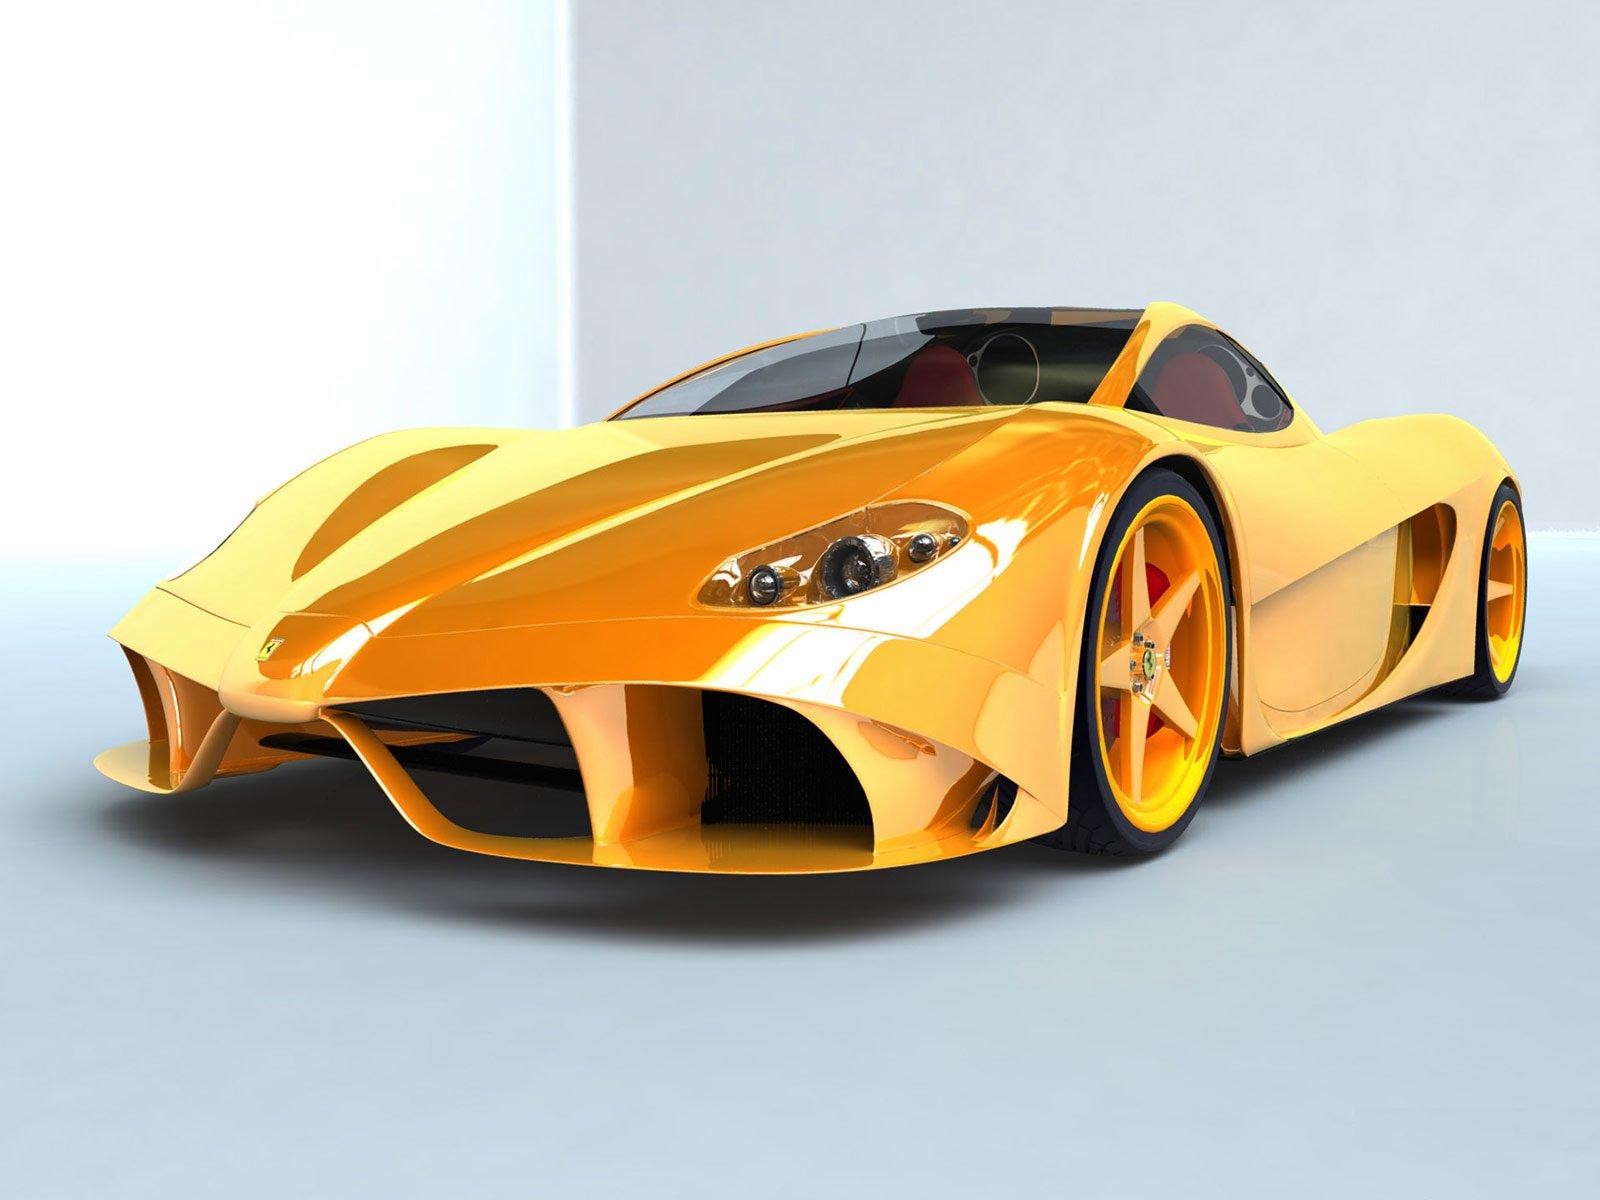 http://4.bp.blogspot.com/_HVsAuLRob2g/TIoO57NU6KI/AAAAAAAAAp0/FiaxCeLLvNQ/s1600/sports-cars-pictures-car.jpg